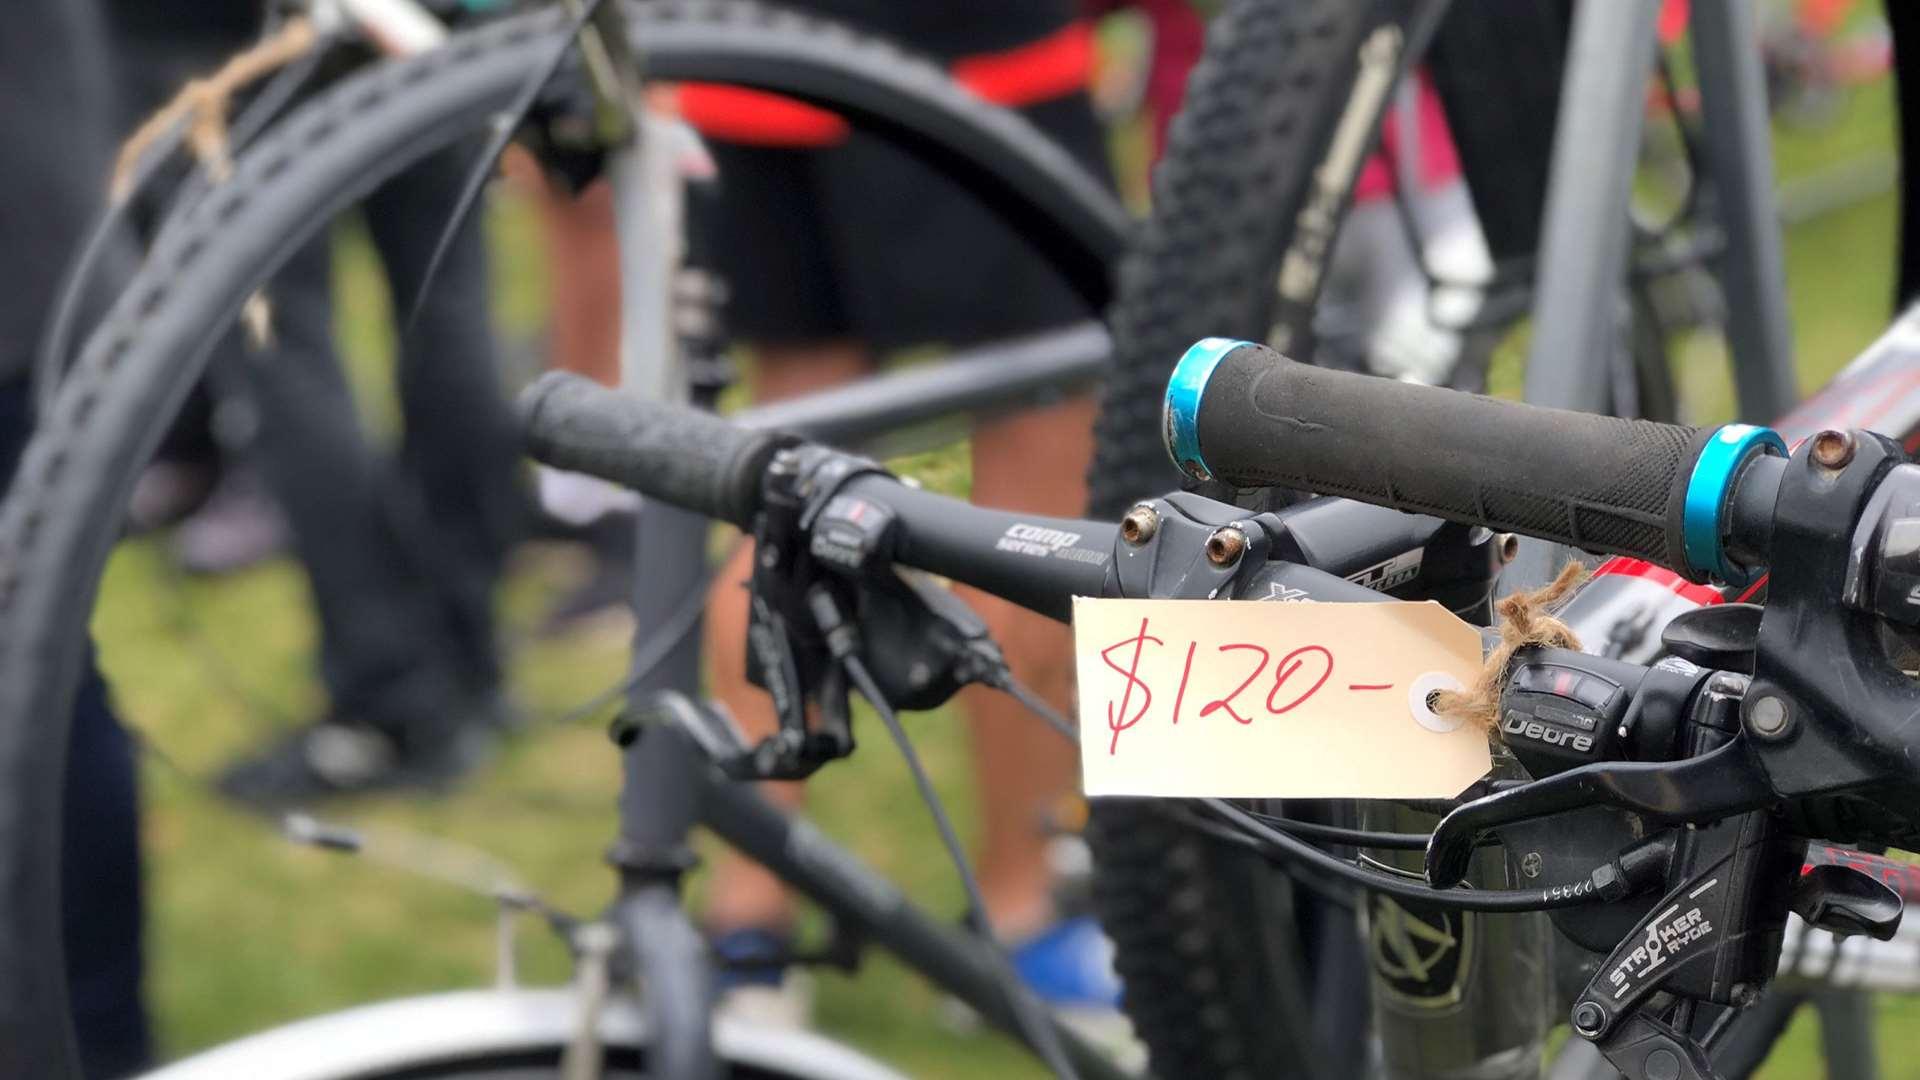 Taupo Secondhand Bike Sale   Love Taupo